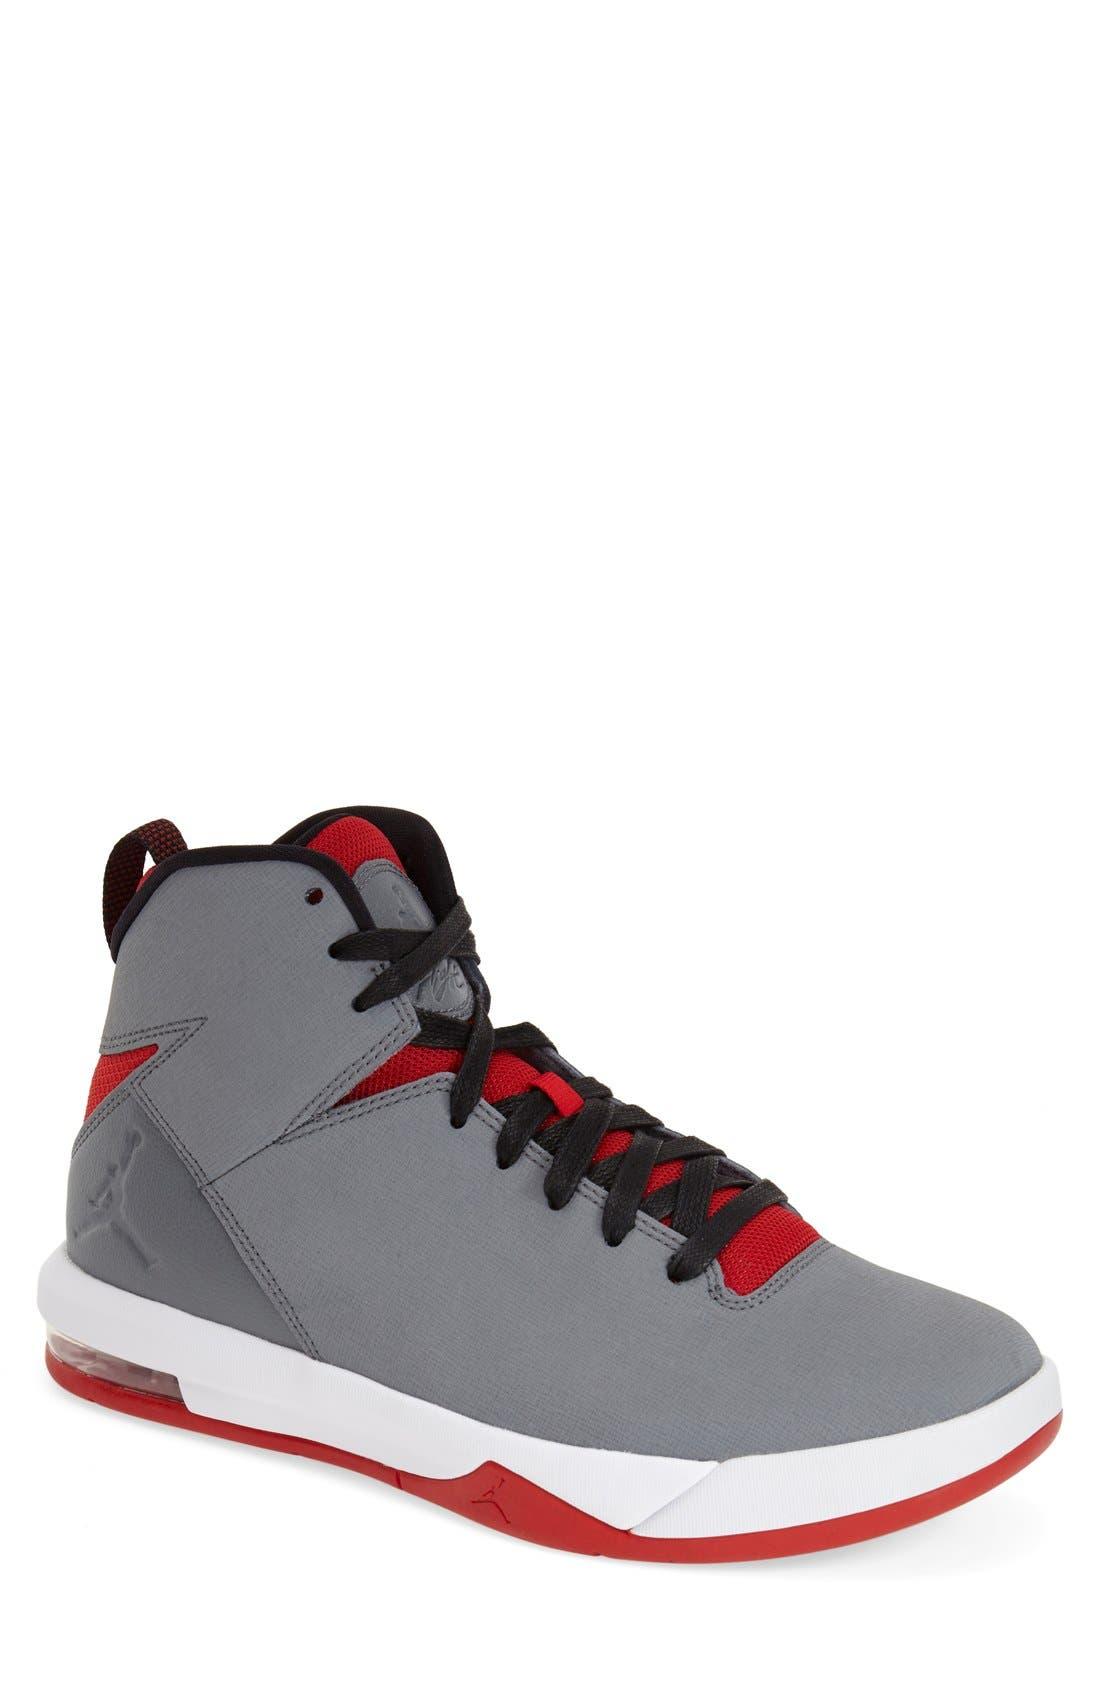 Main Image - Nike 'Jordan Air Imminent' Sneaker (Men)